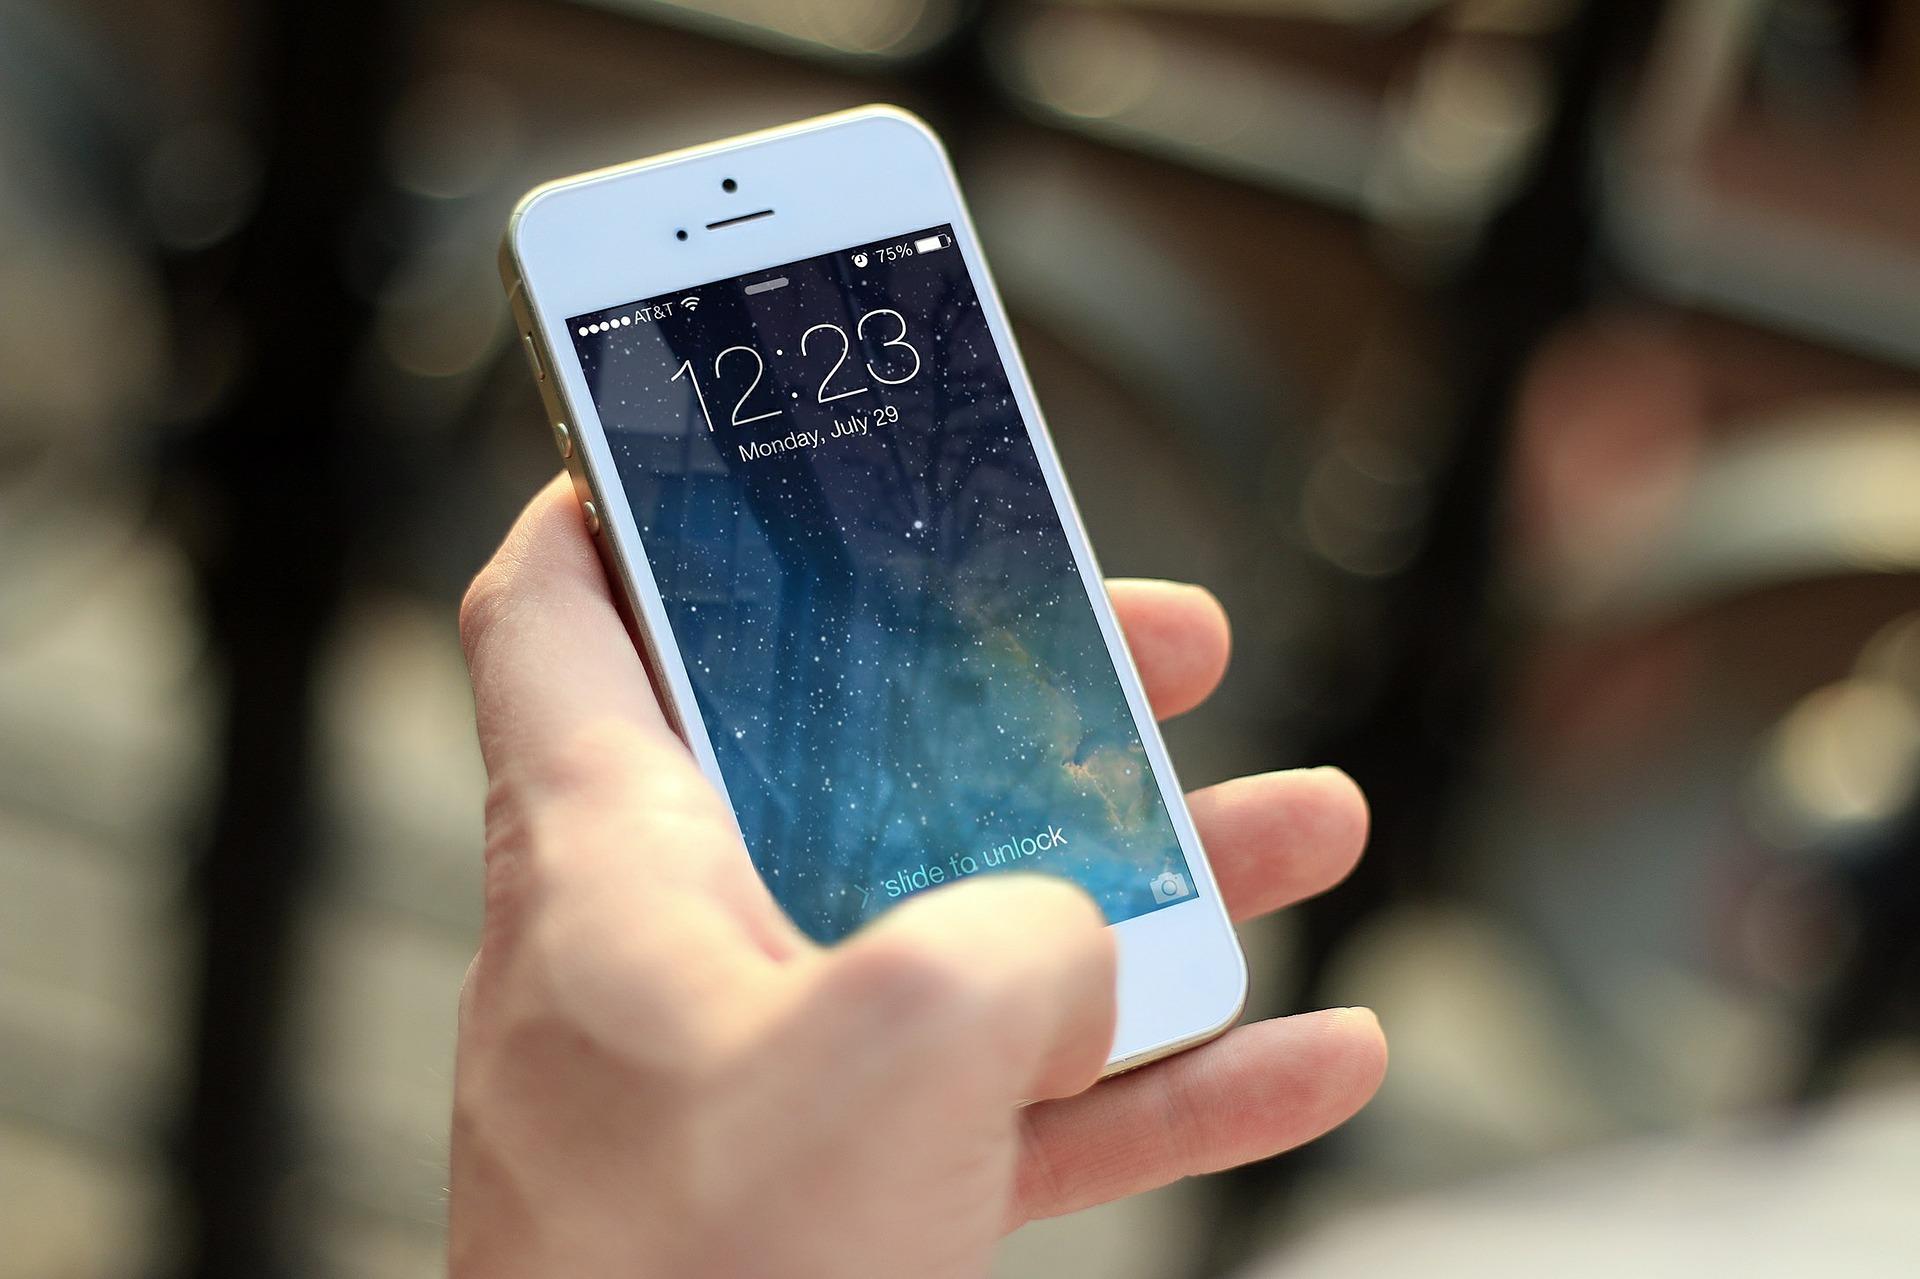 iphone-410324_1920.jpg